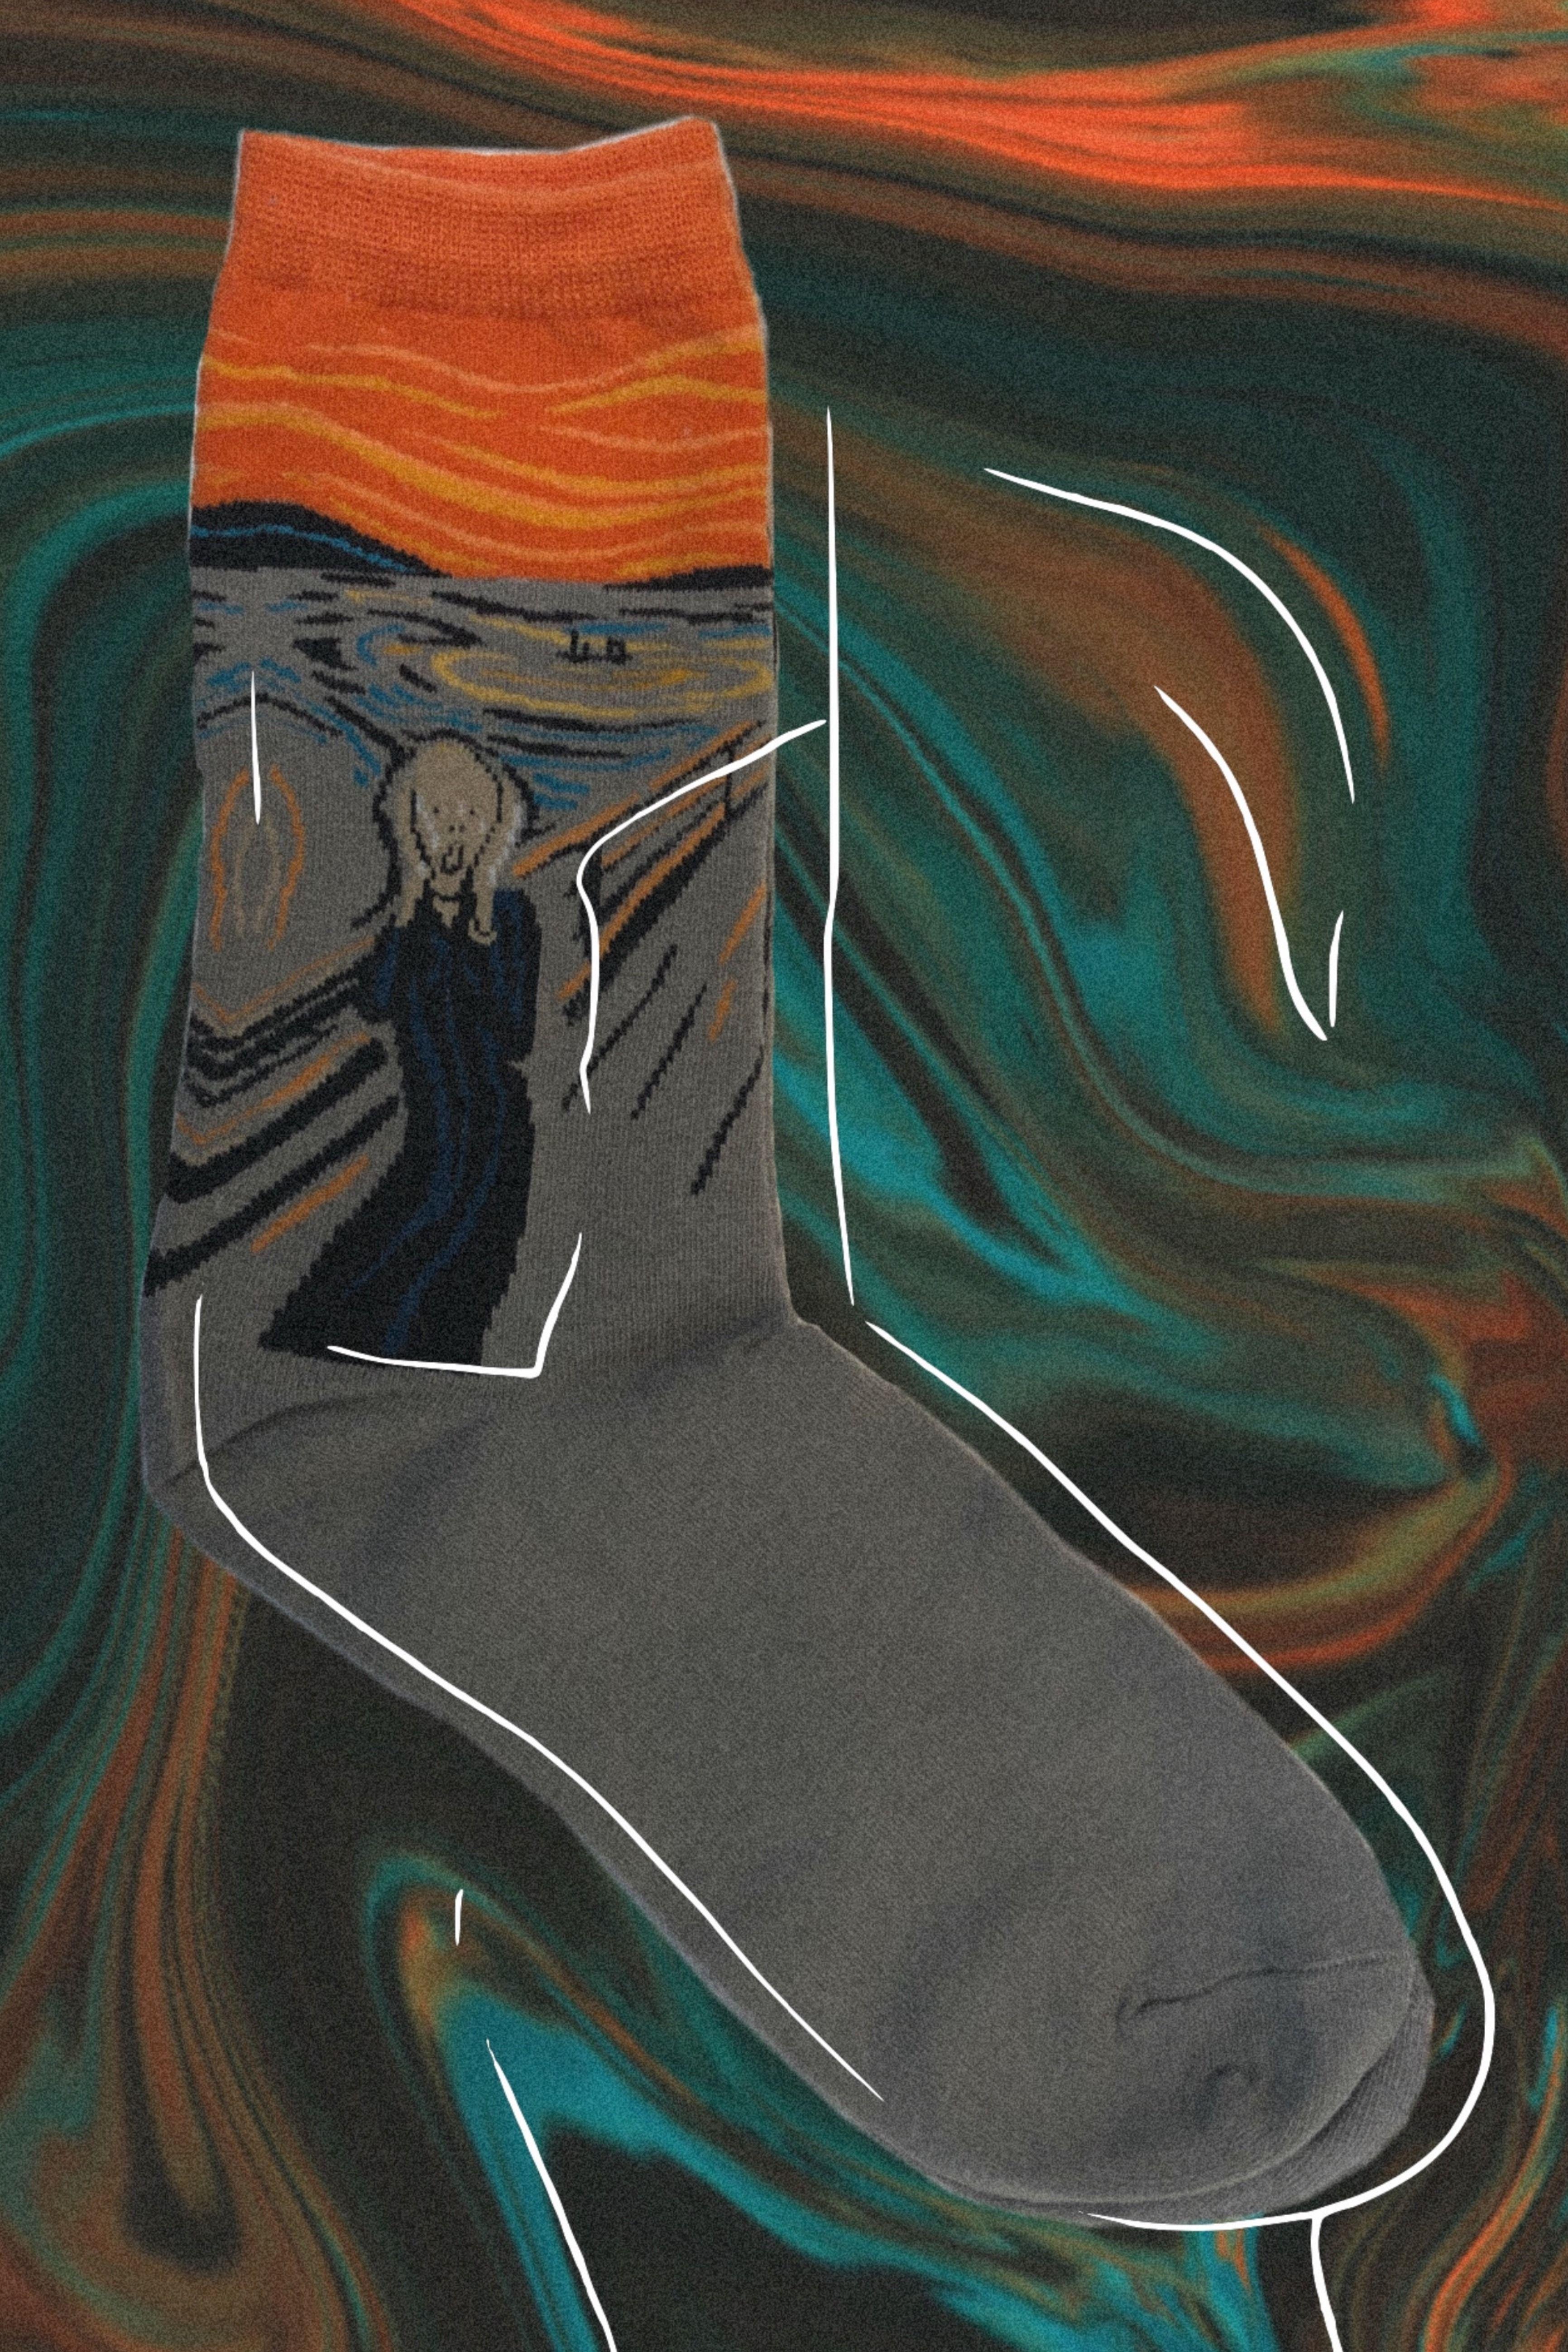 Artistic Socks Trendy Socks Socks Boots